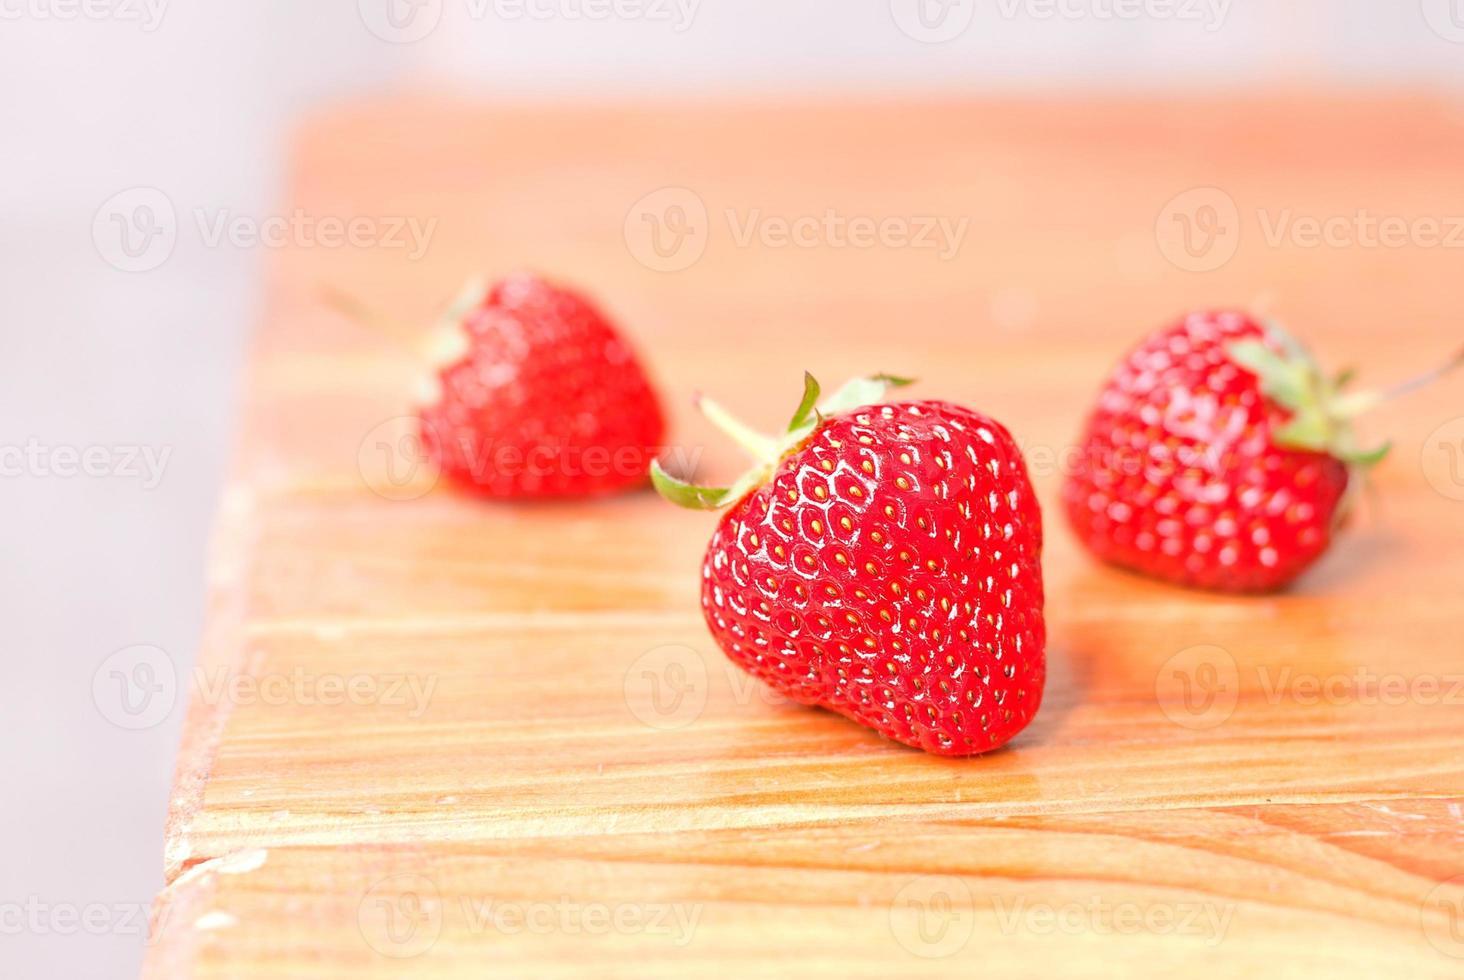 tres fresas en la mesa, vista lateral foto